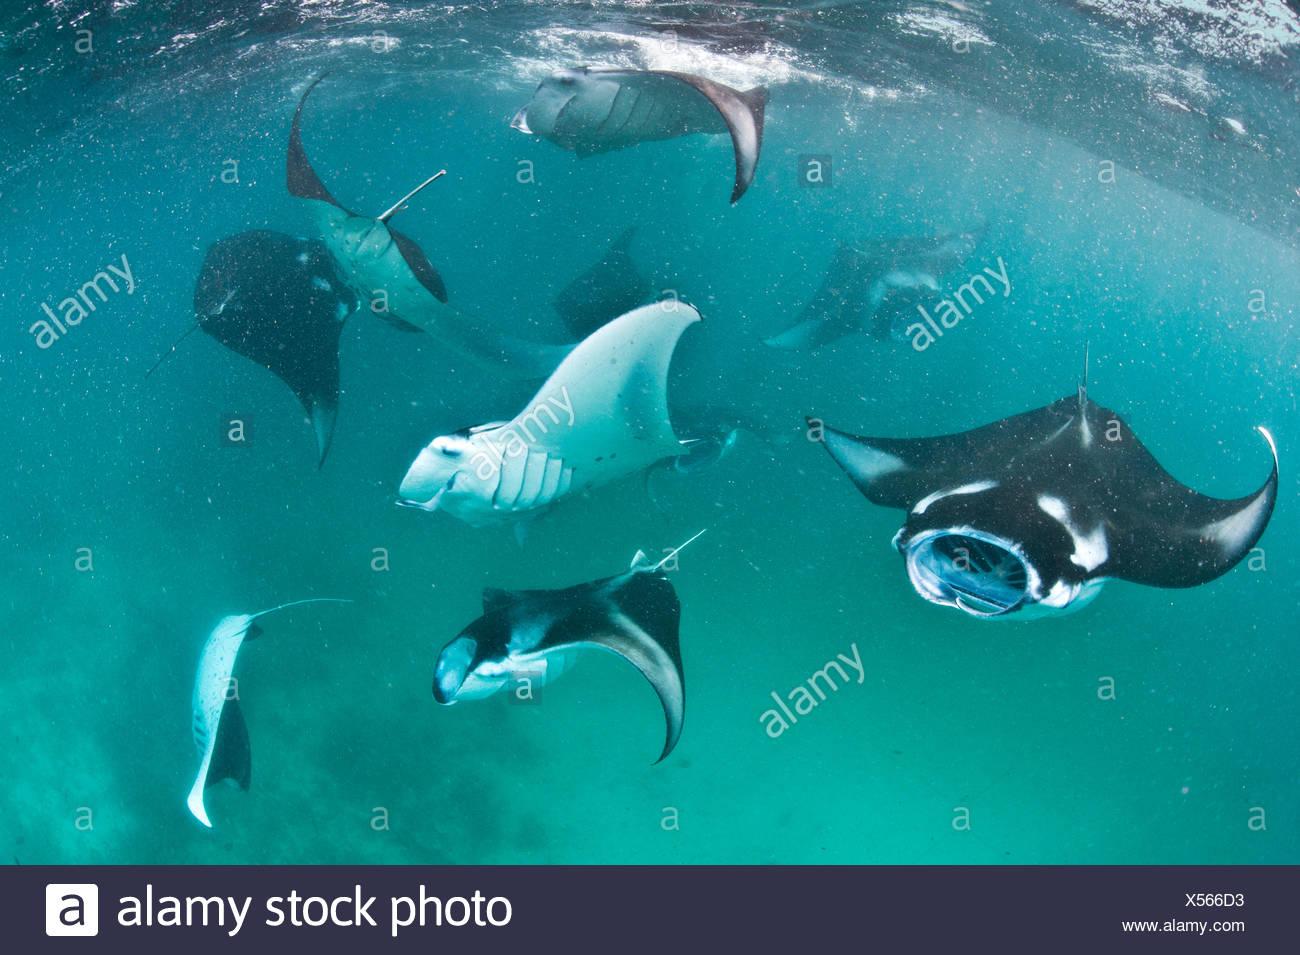 Group of Manta rays (Manta birostris) feeding together on plankton in a shallow lagoon. Hanifaru Lagoon, Baa Atoll, Maldives. Indian Ocean. Stock Photo